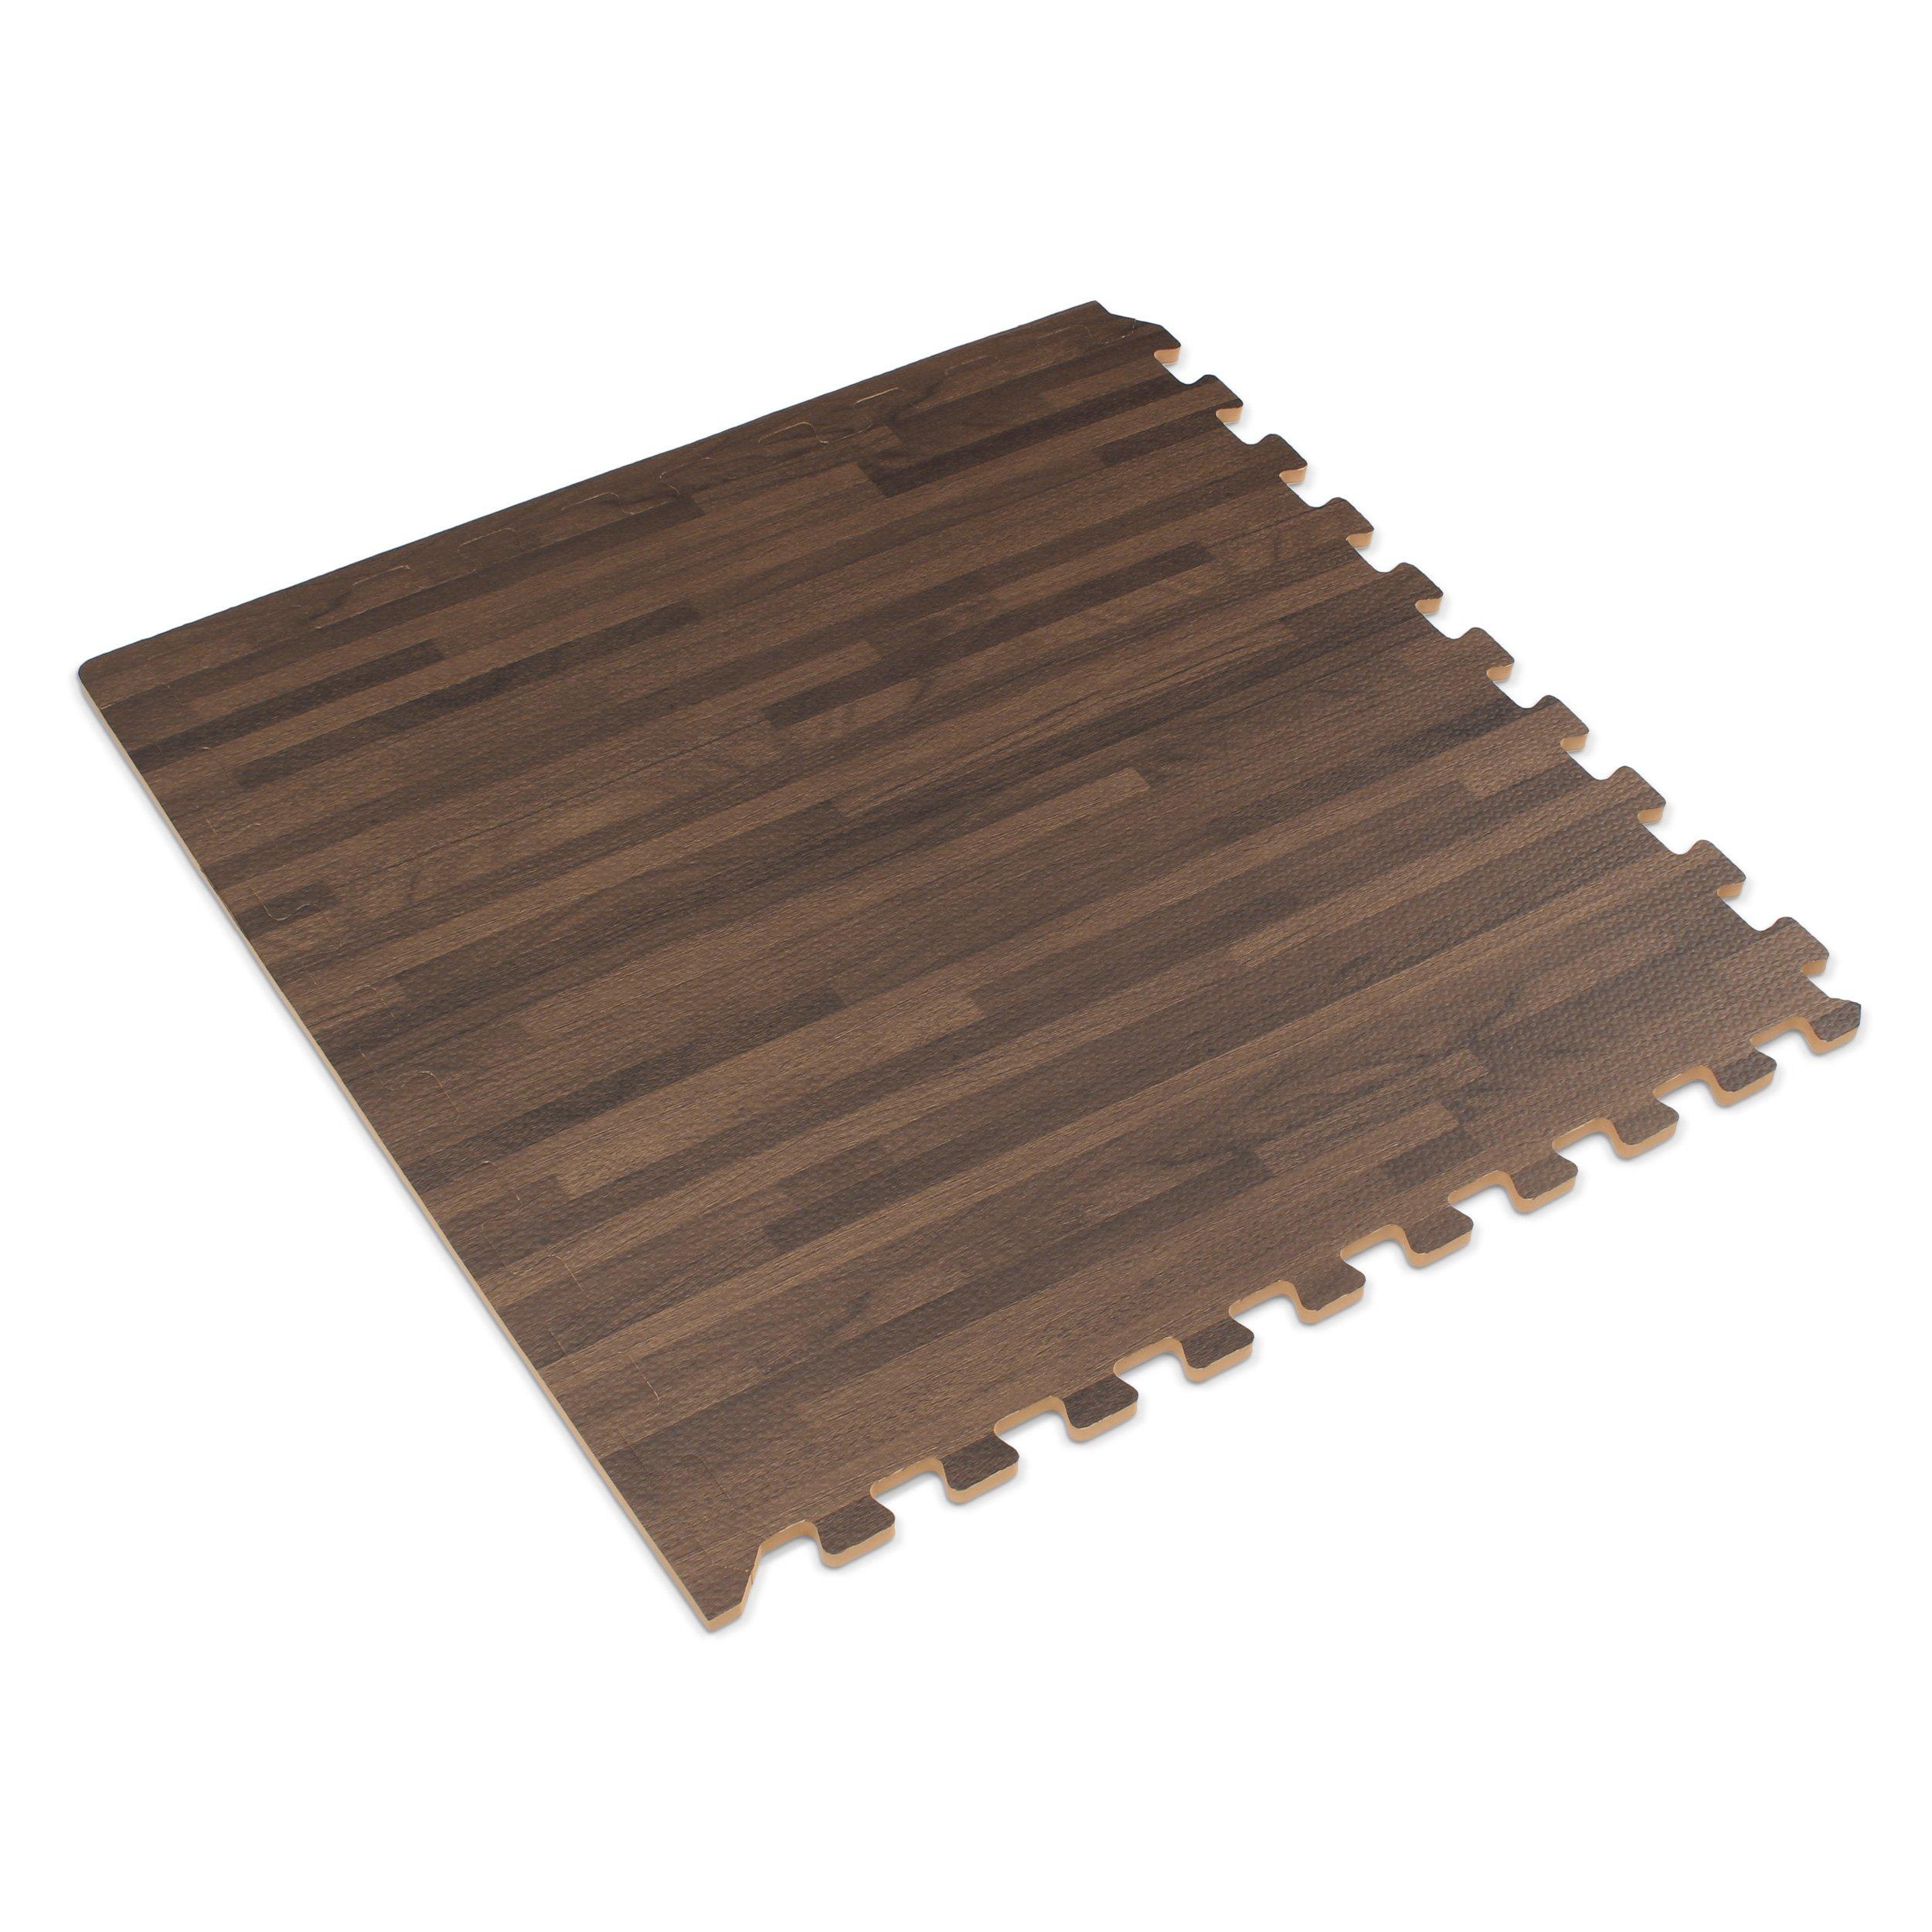 Forest Floor 3/8'' Thick Printed Wood Grain Interlocking Foam Floor Mats, 16 Sq Ft (4 Tiles), Walnut by Forest Floor (Image #2)